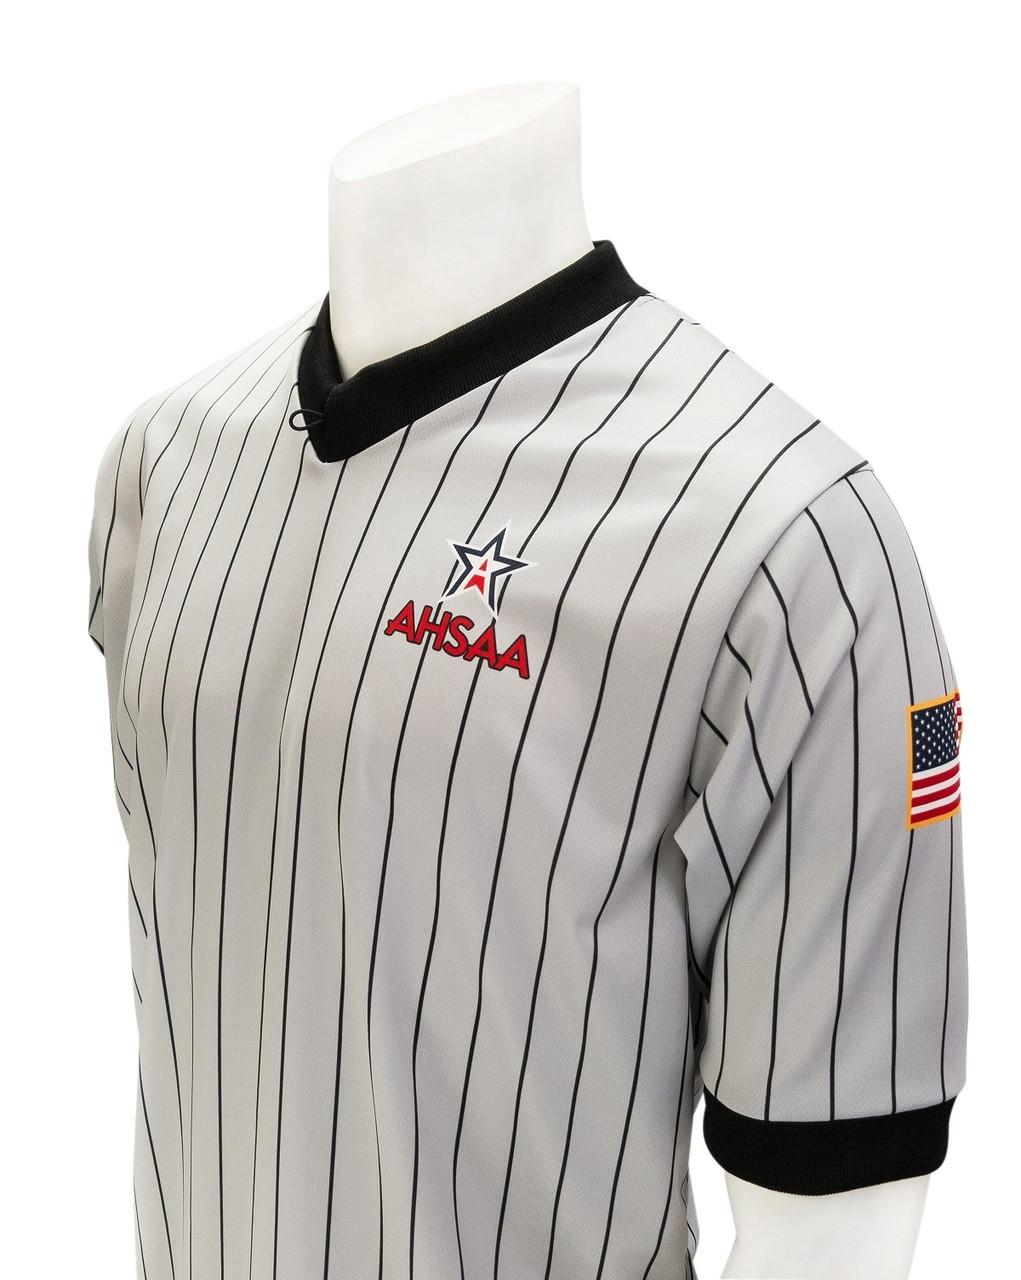 Alabama AHSAA Men's Wrestling Referee Shirt